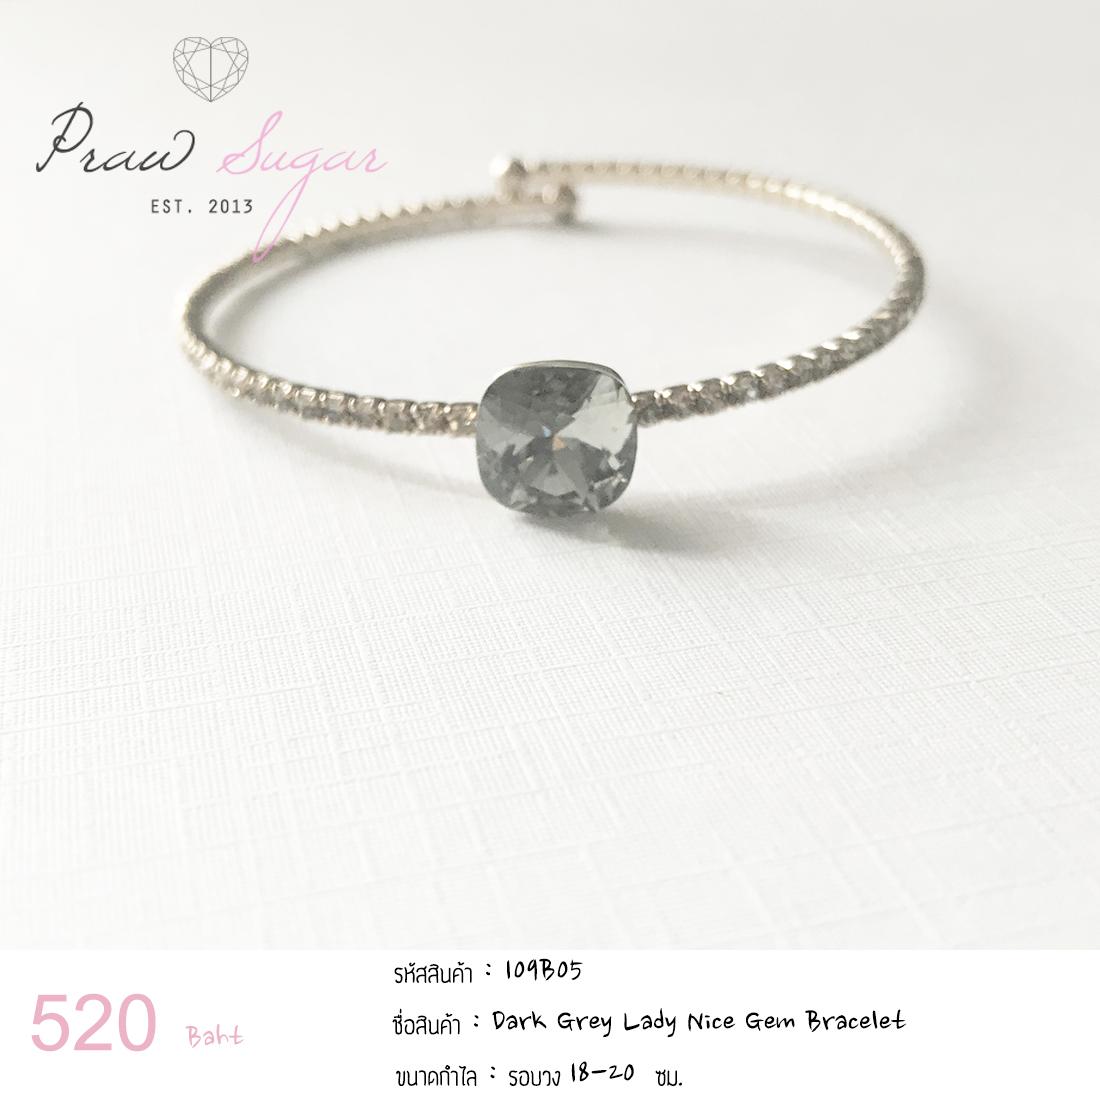 Dark Grey Lady Nice Gem Bracelet